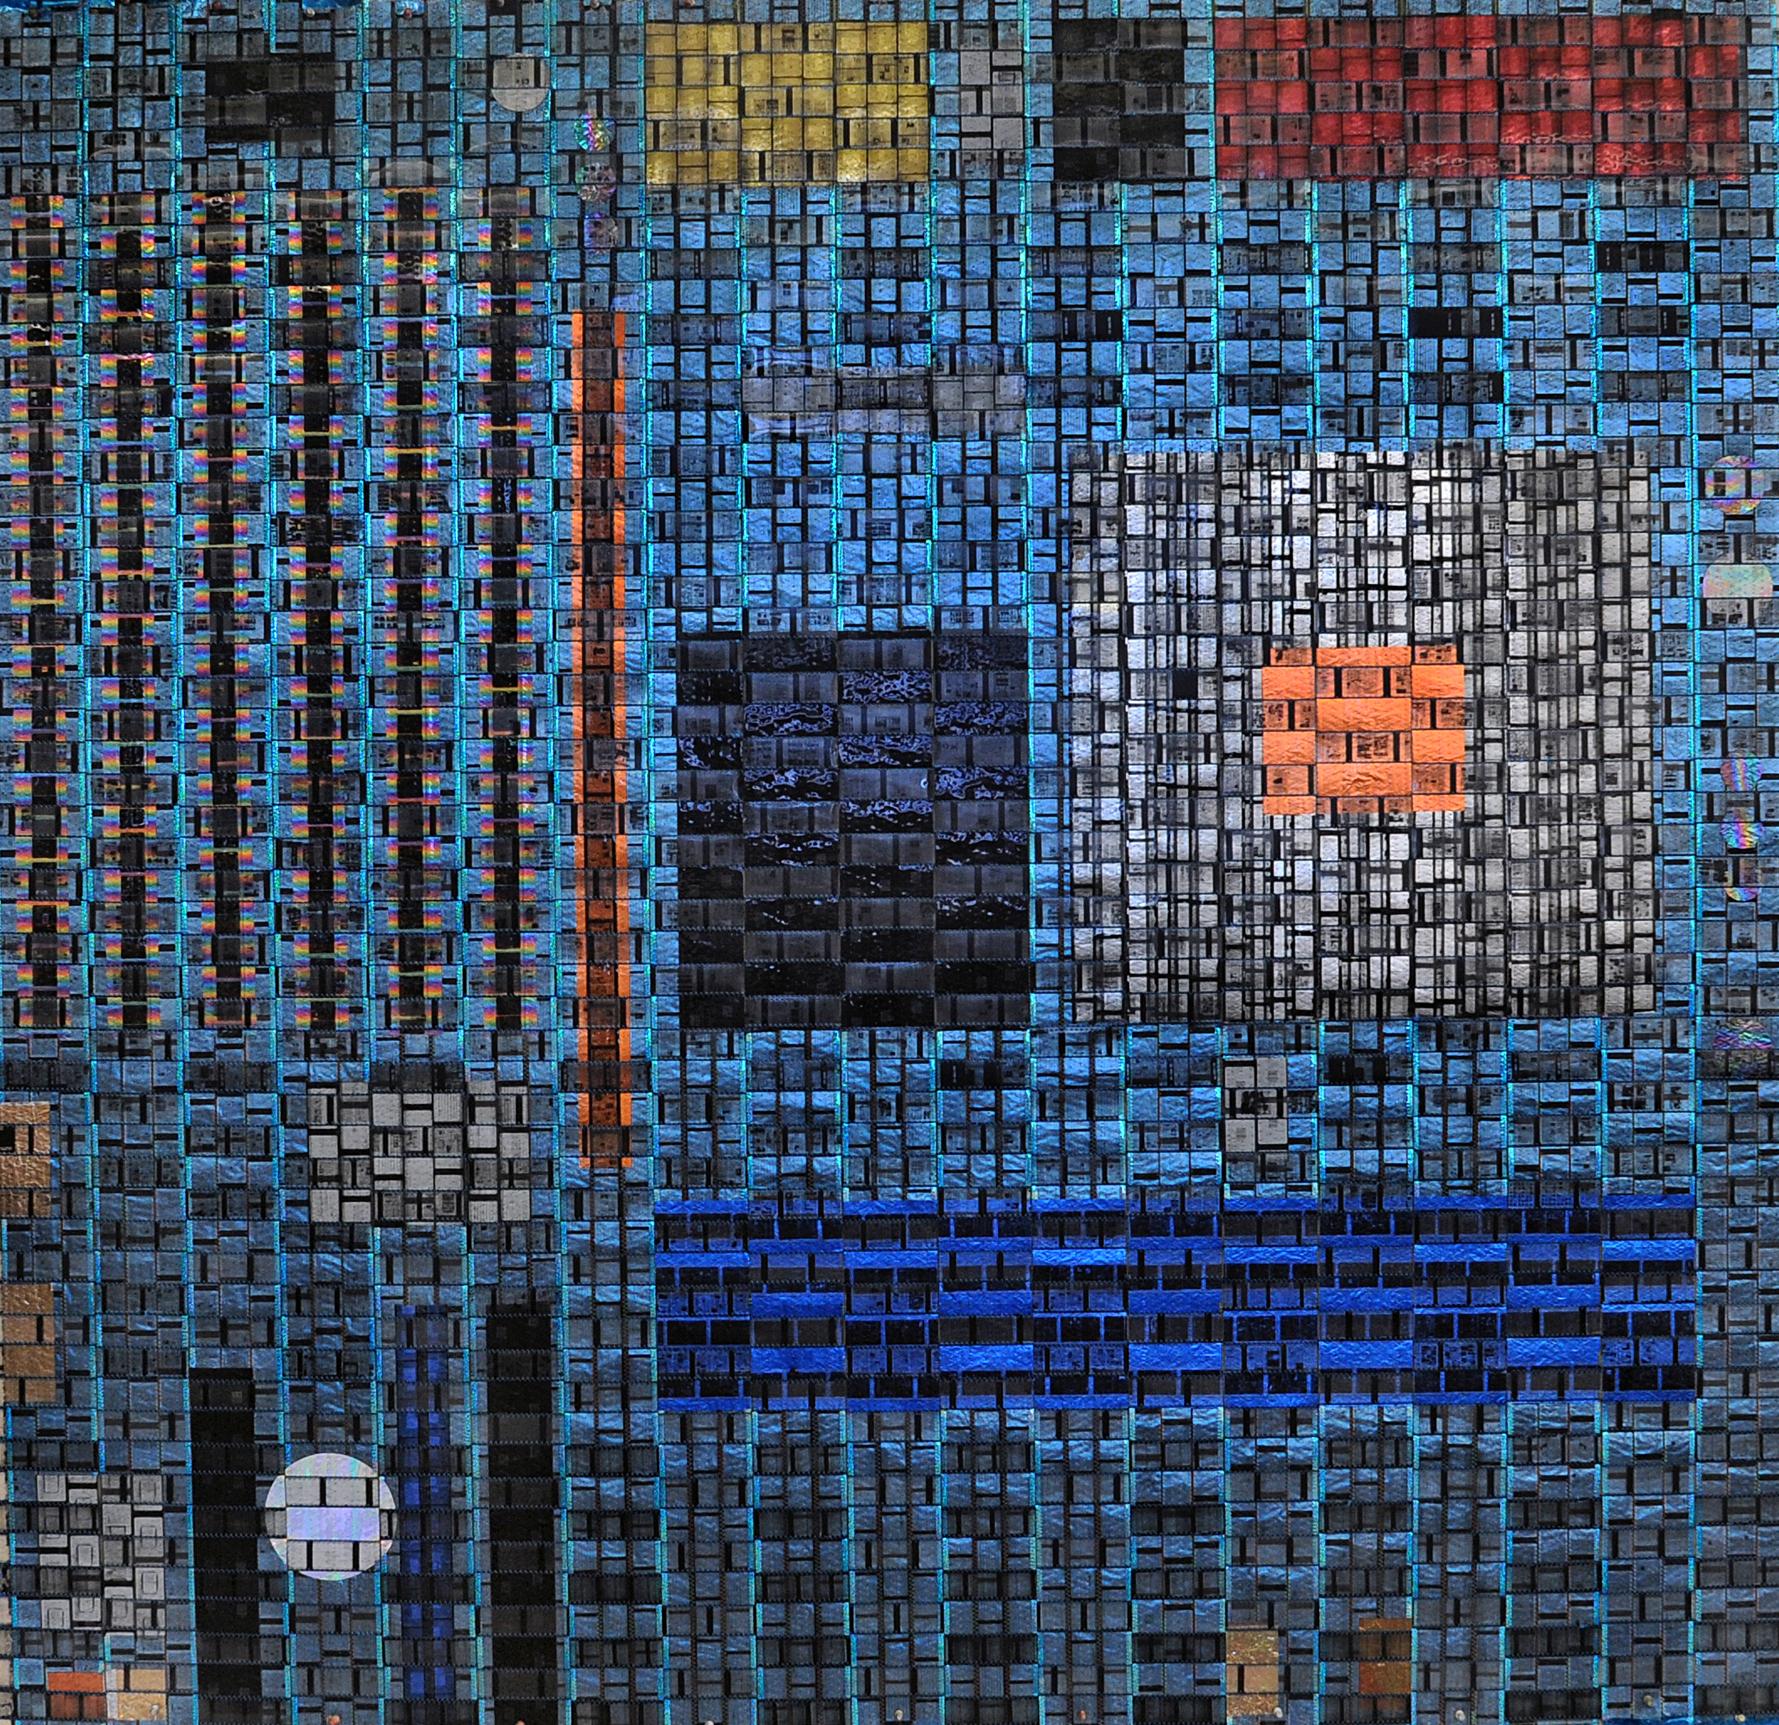 """Pattern Fusion No. 12: Motherboard 3"" by Arturo Alonzo Sandoval. 2009. Mixed media."